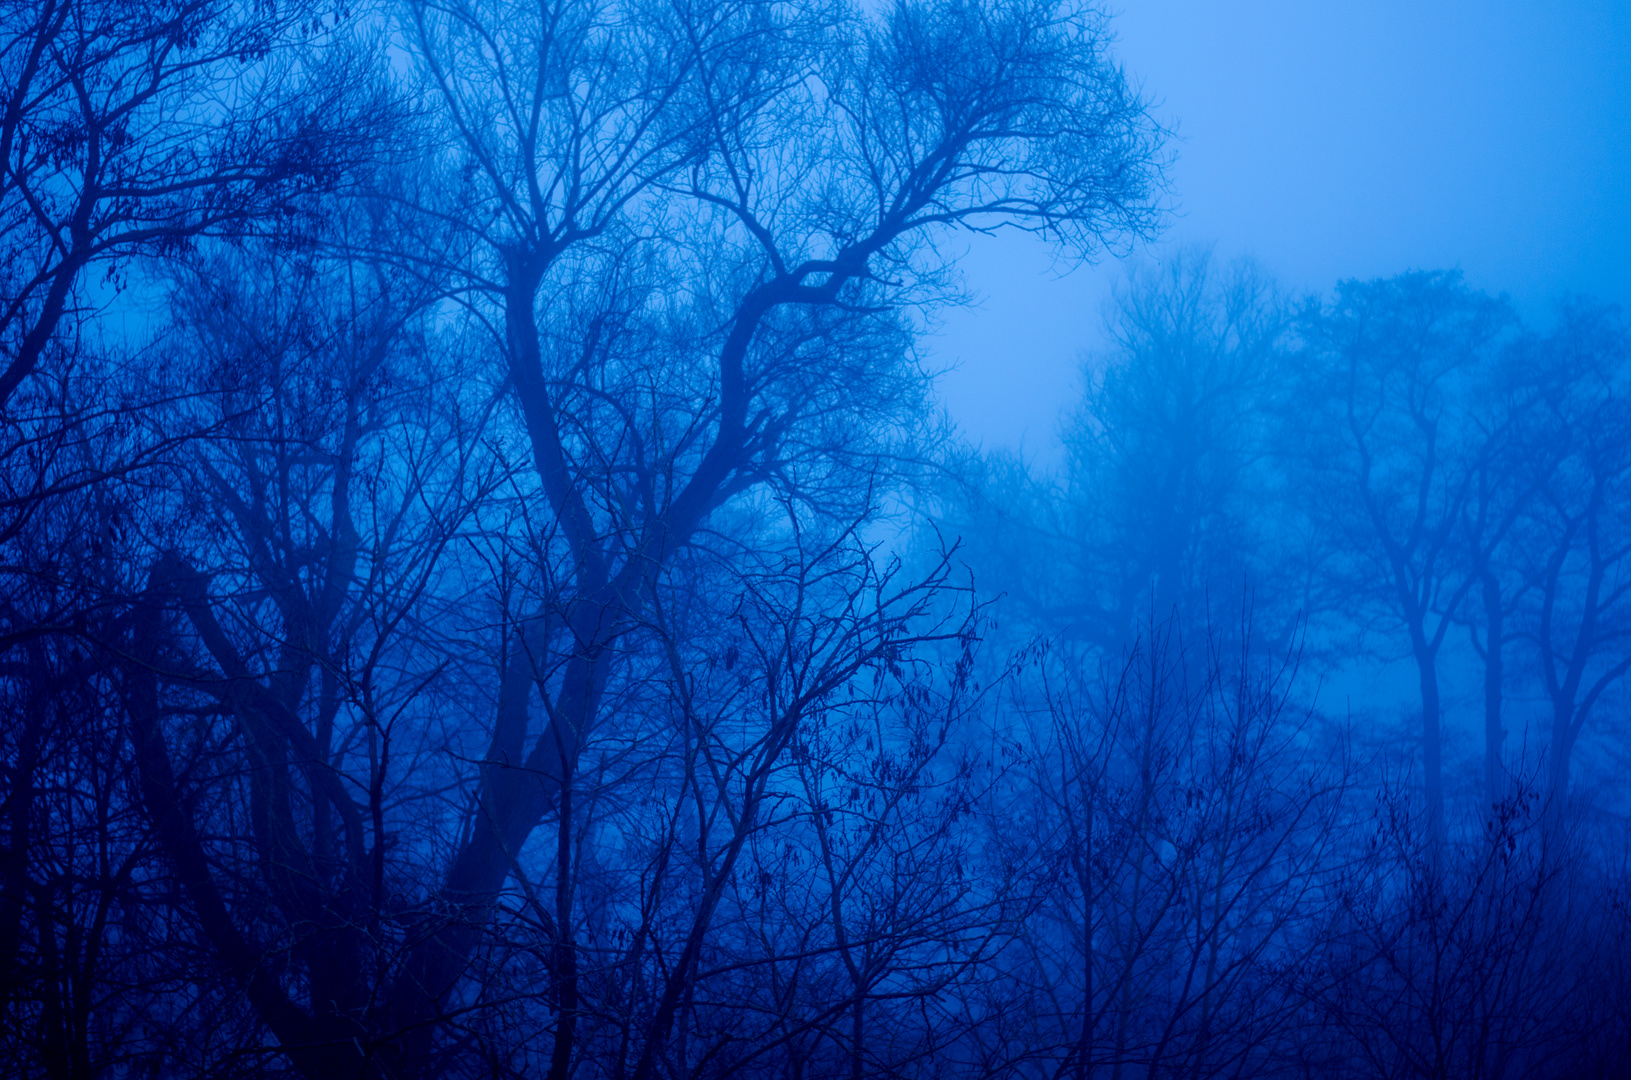 Waldstück im Nebel